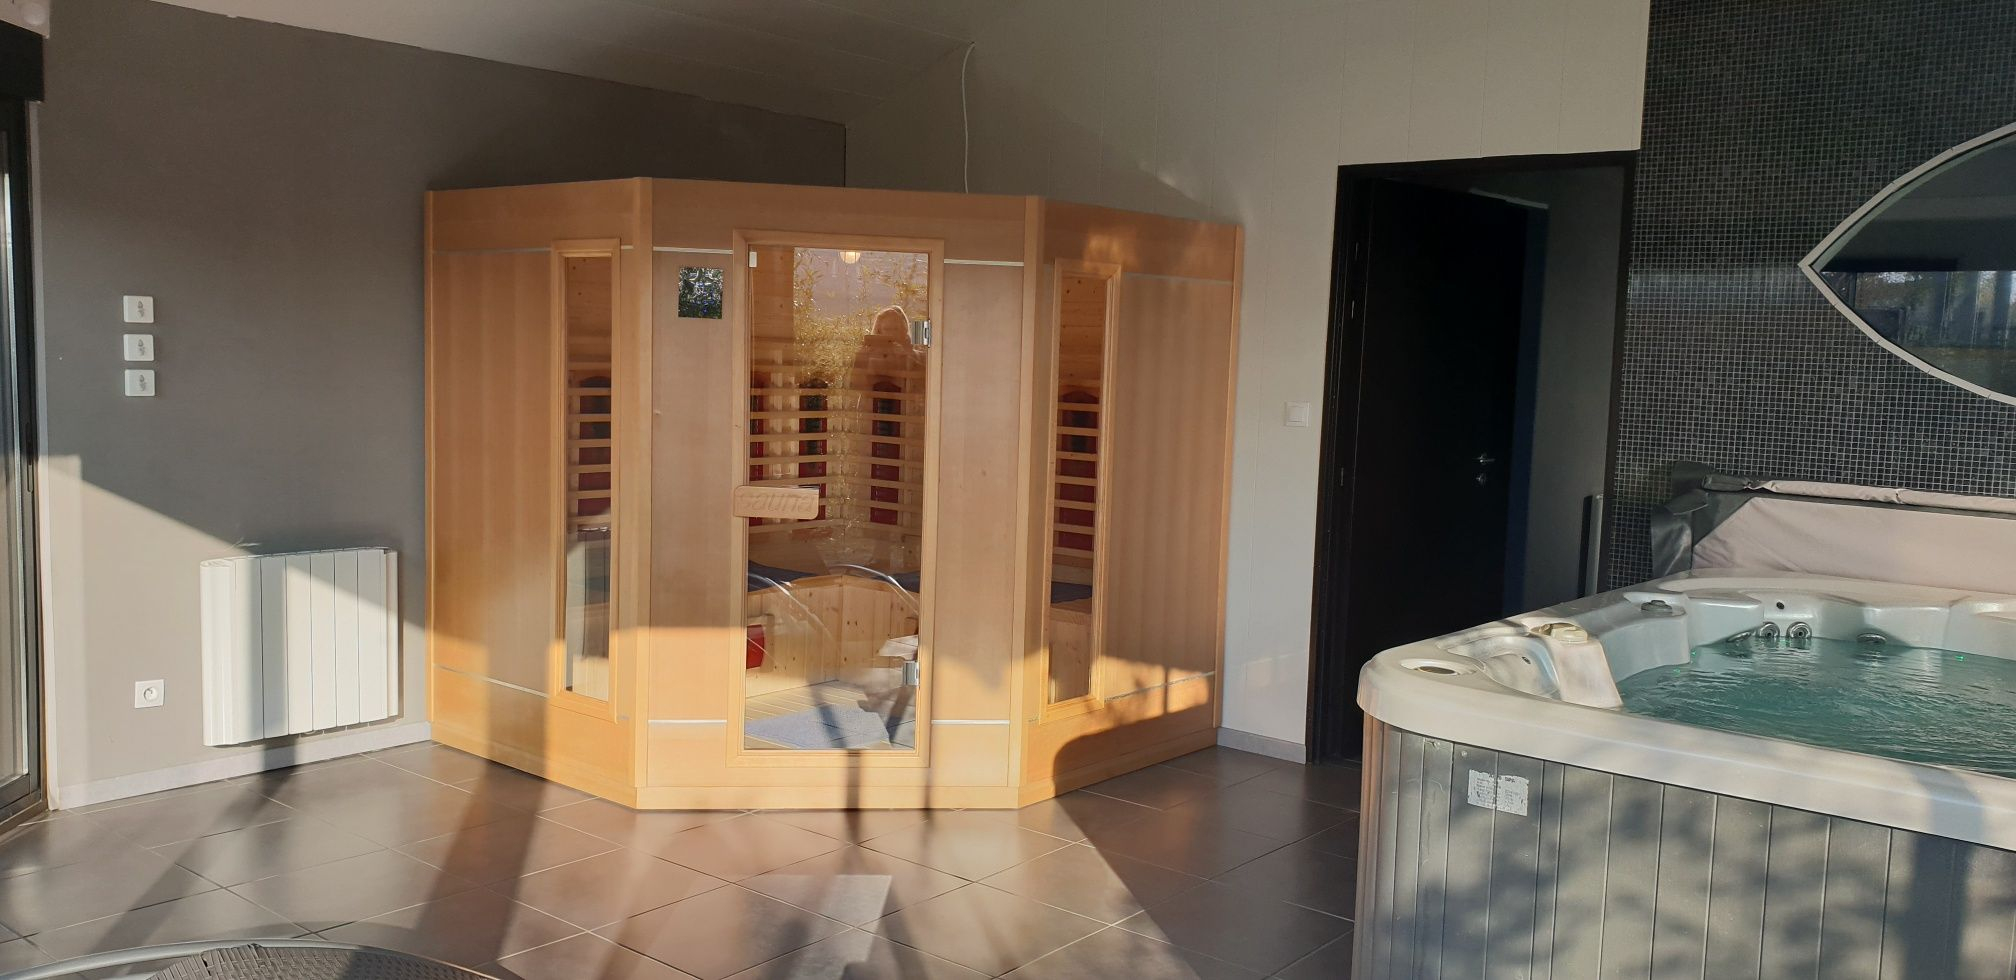 Natura Zen (Chambre Avec Spa Privatif Proche Lille) De concernant Chambre Avec Jacuzzi Privatif Nord Pas De Calais